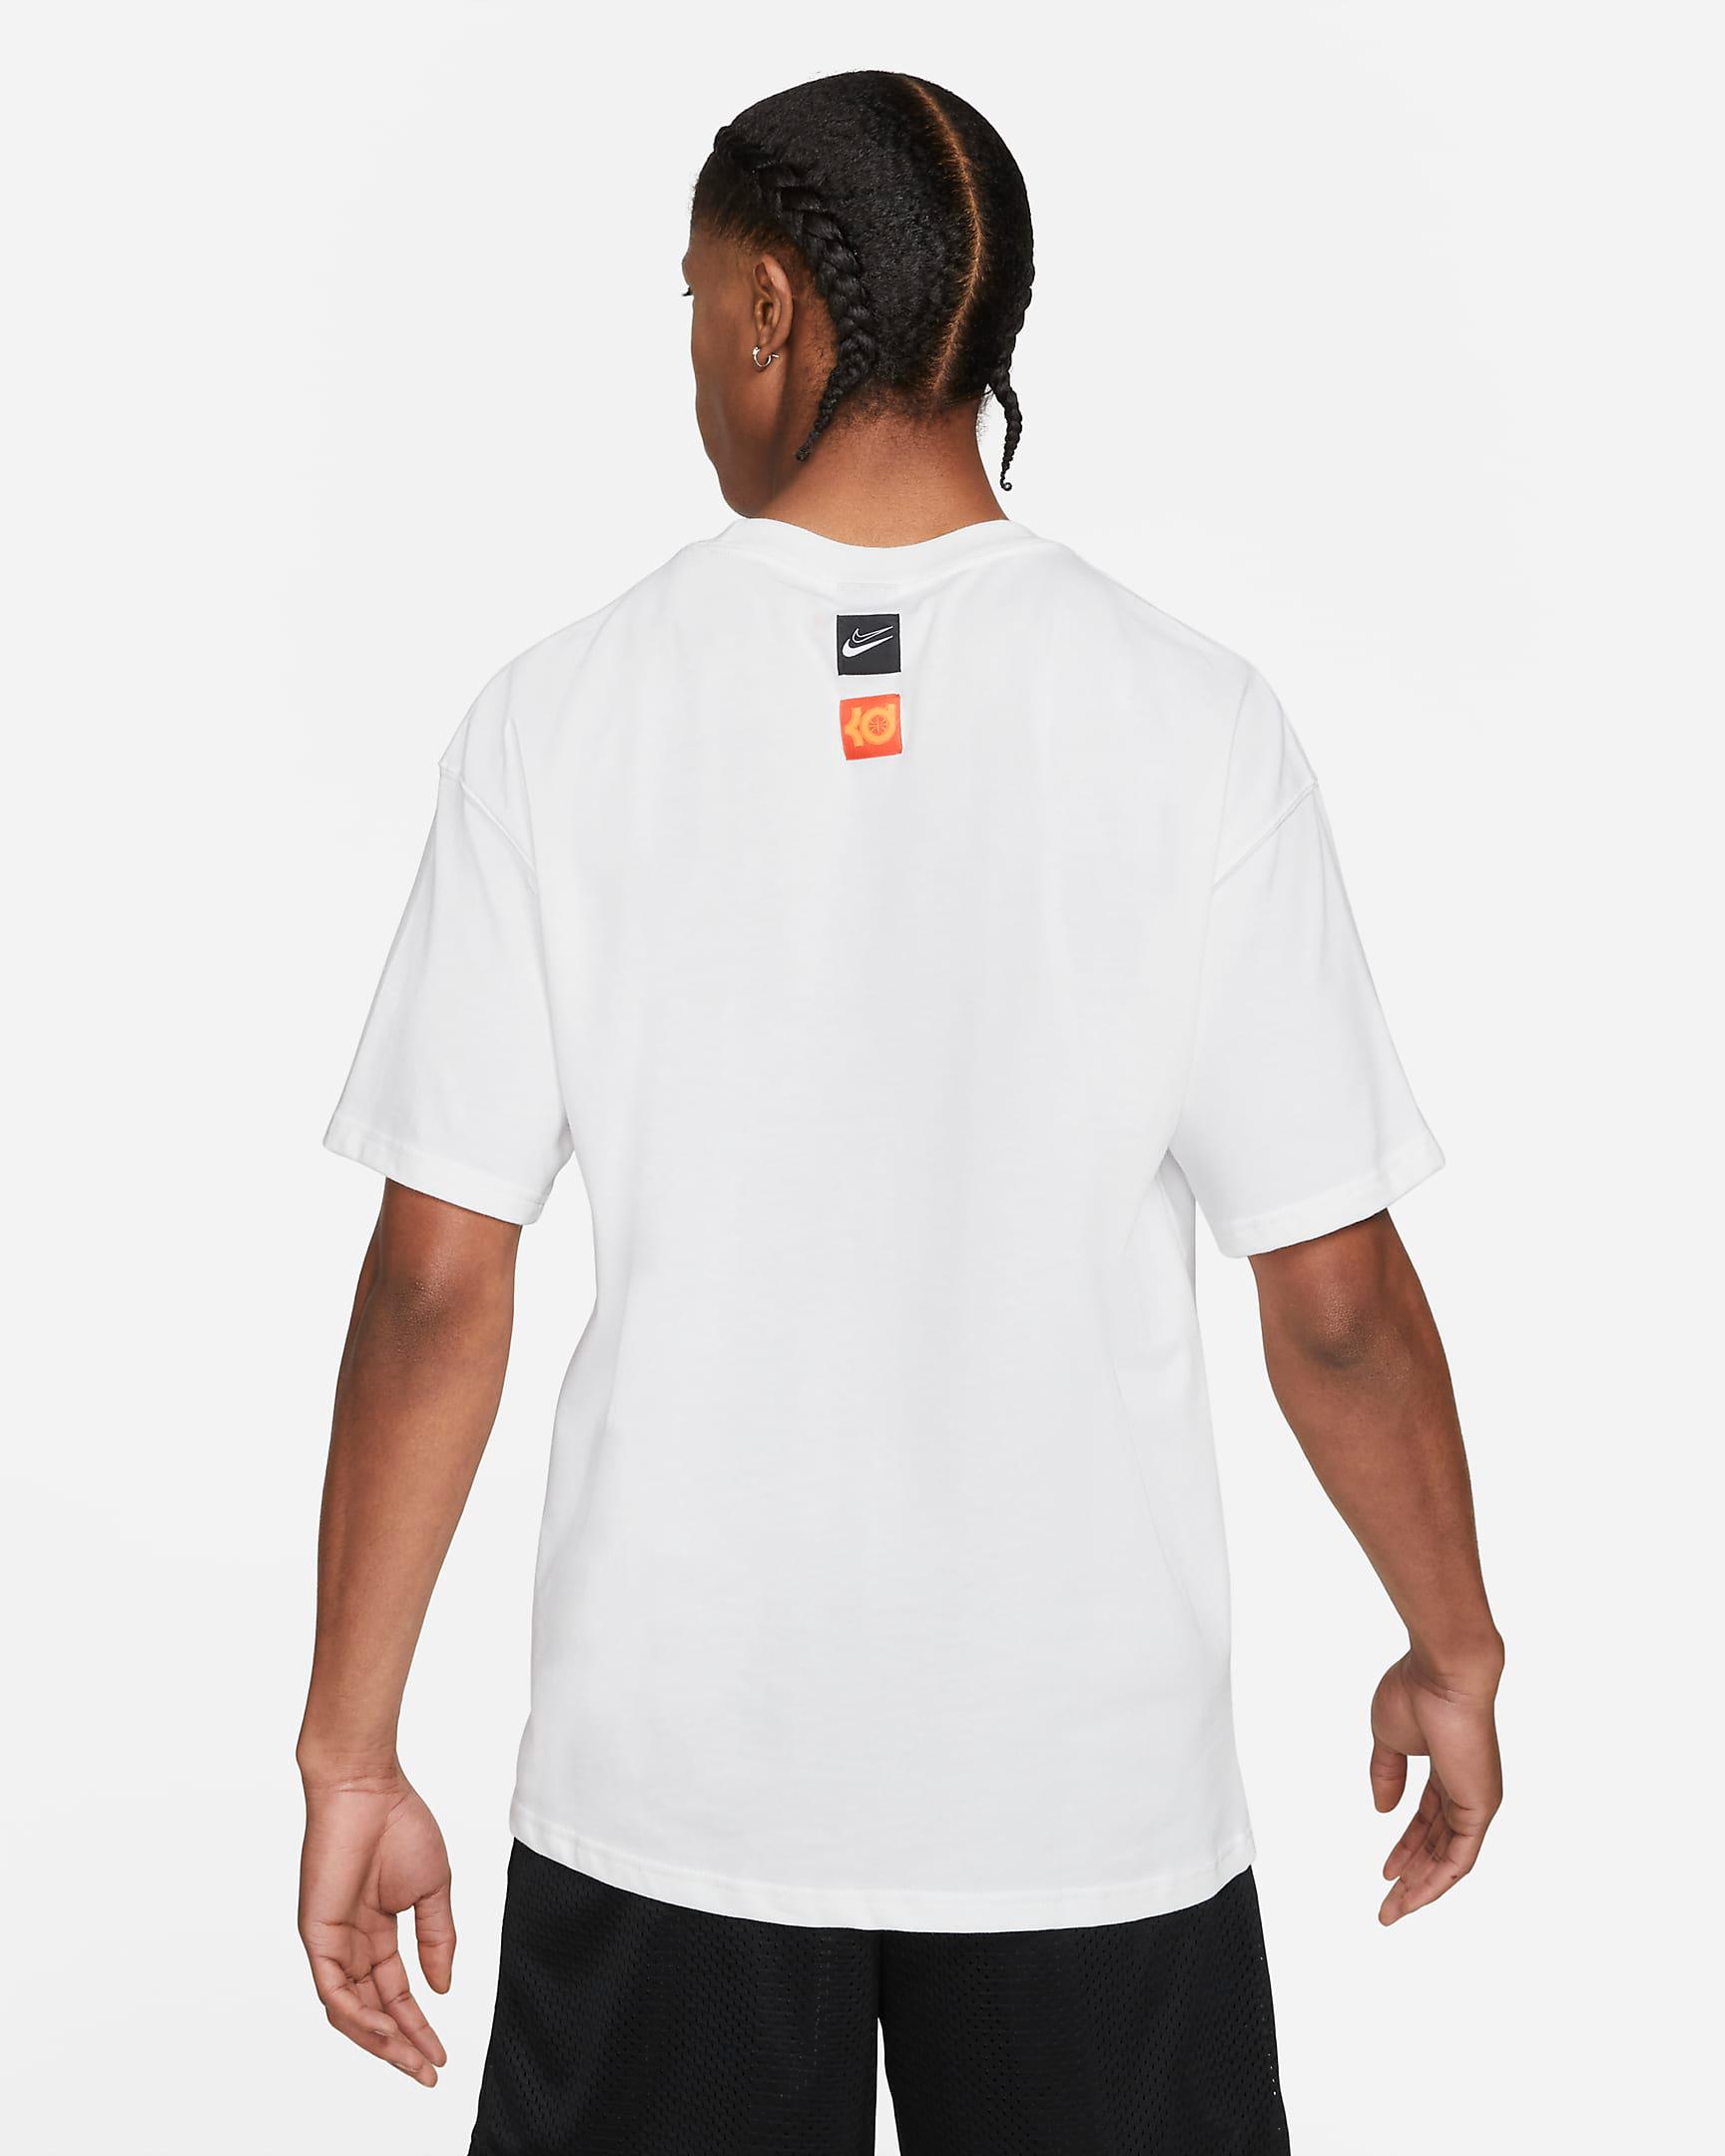 nike-kd-14-slim-reaper-shirt-white-black-2